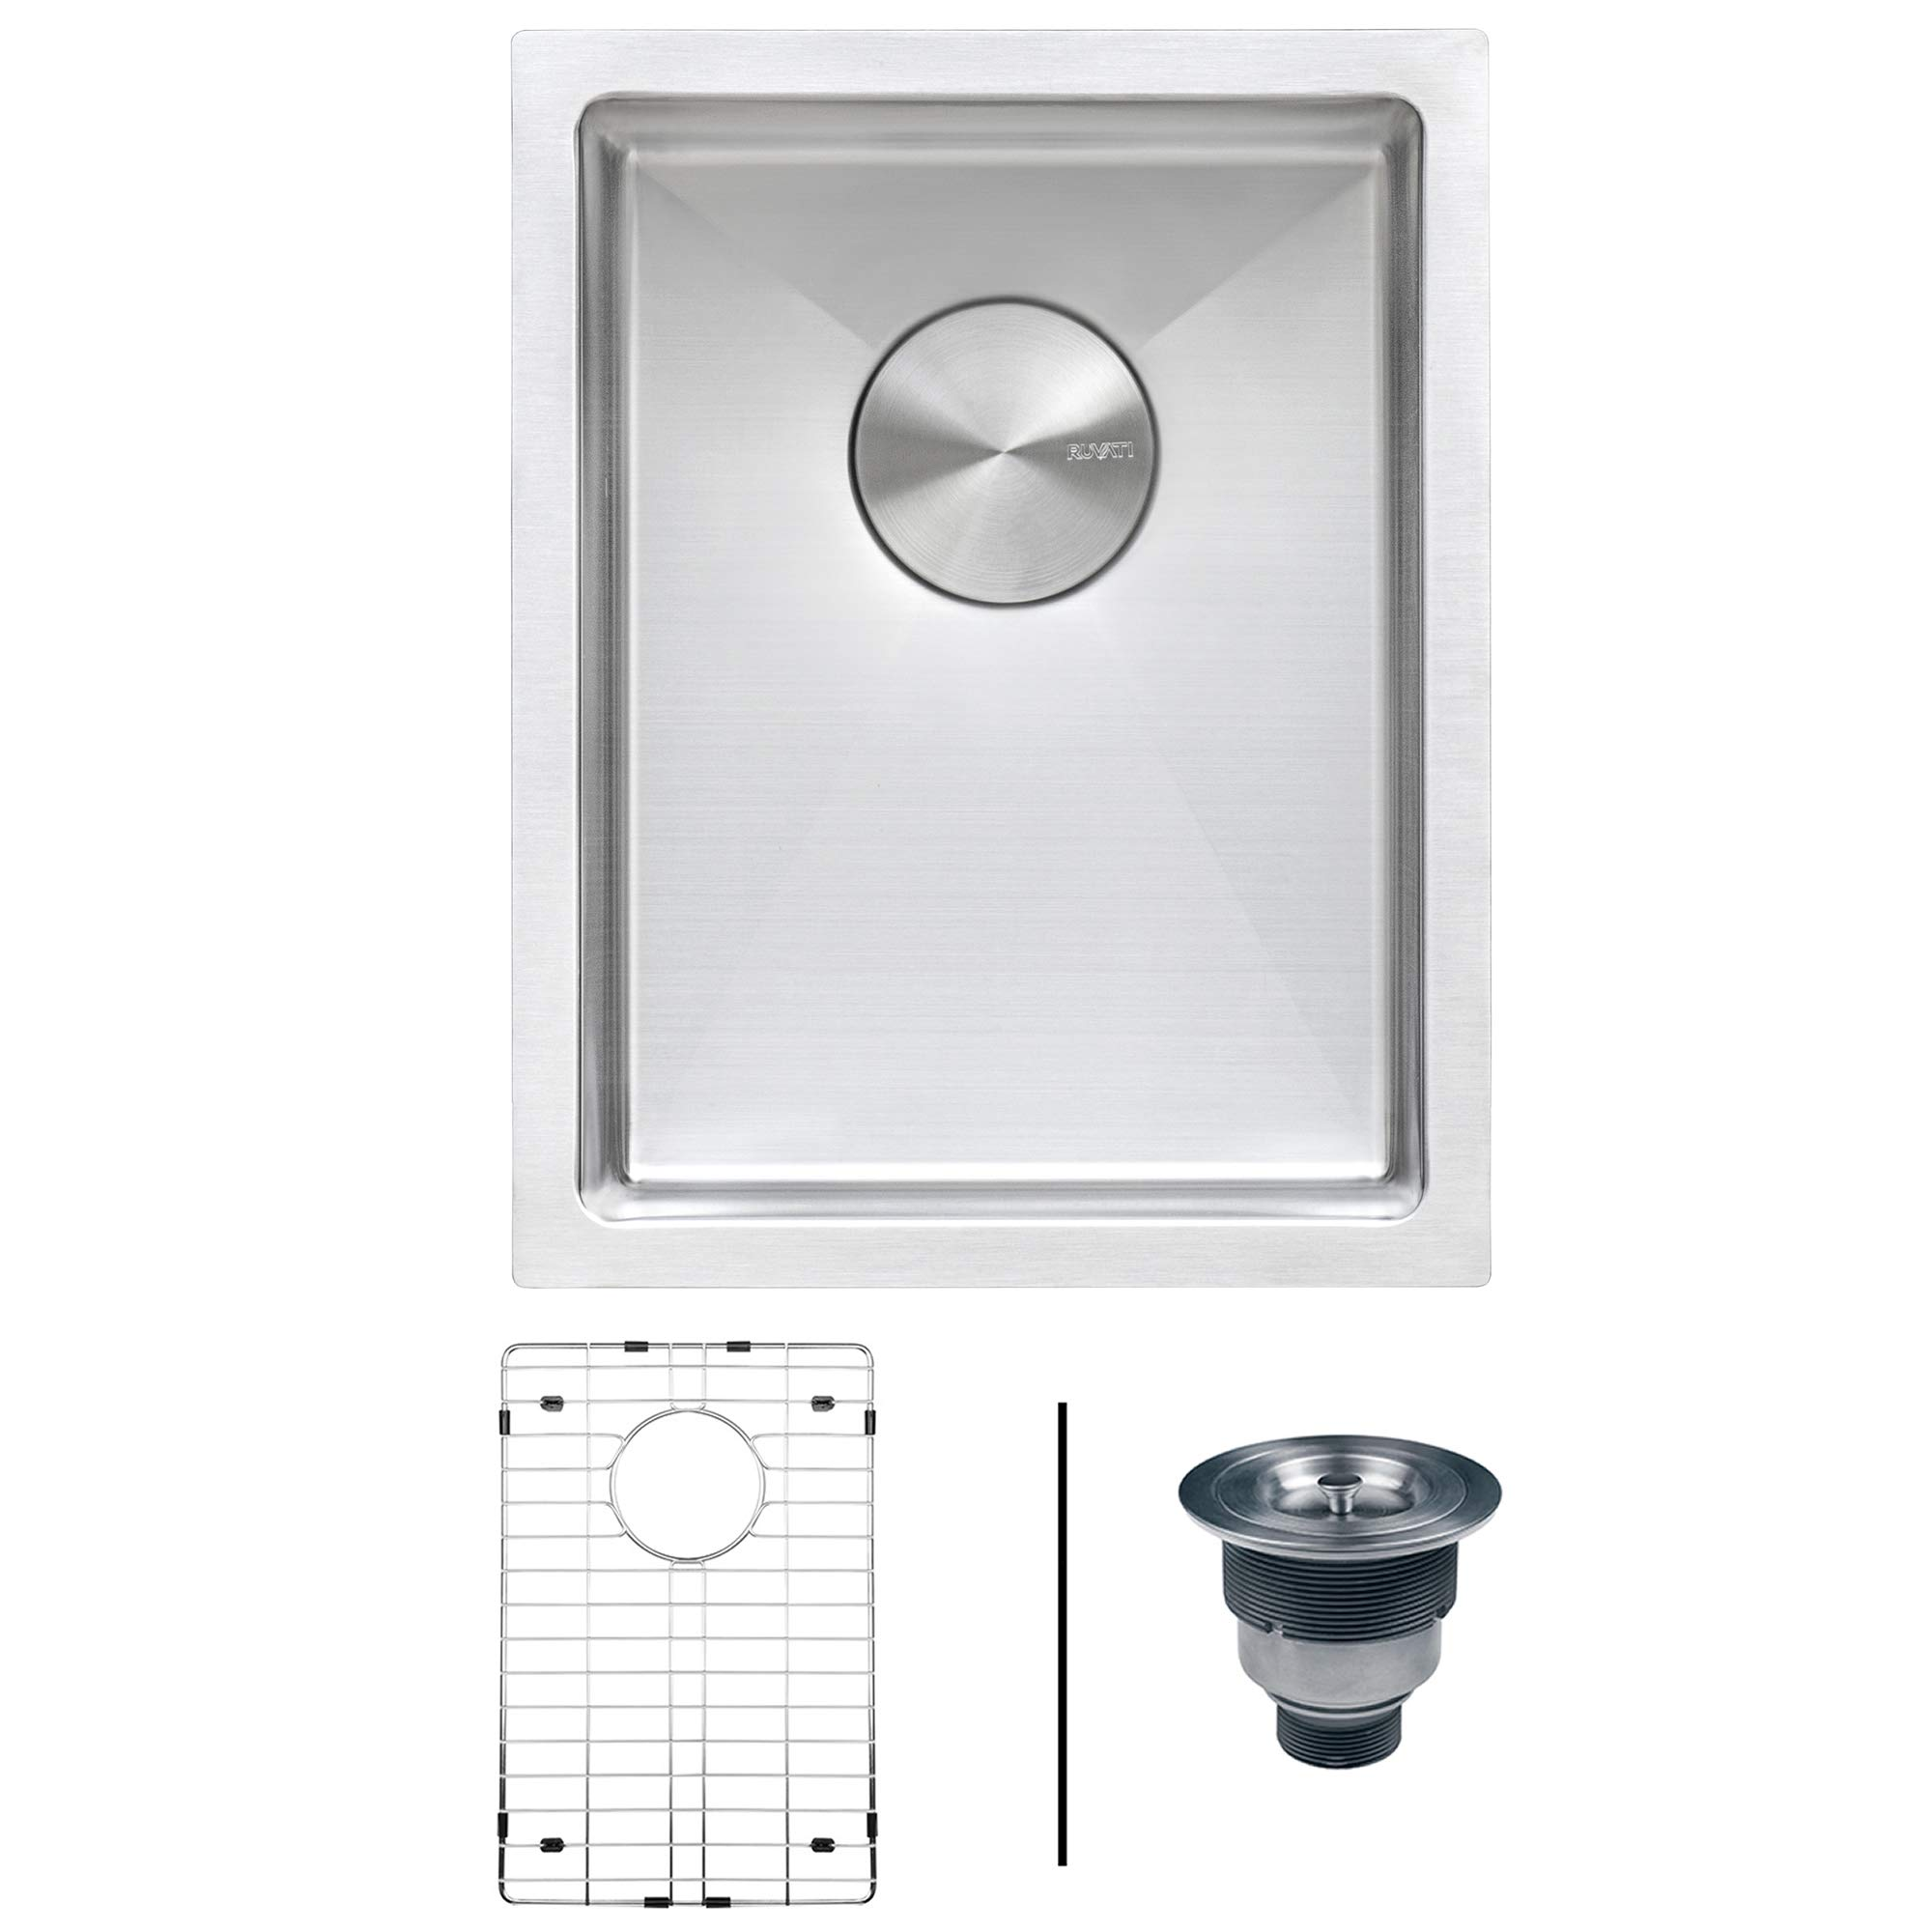 Ruvati 14-inch Undermount Wet Bar Prep Sink Tight Radius 16 Gauge Stainless Steel Single Bowl - RVH7114 by Ruvati (Image #1)